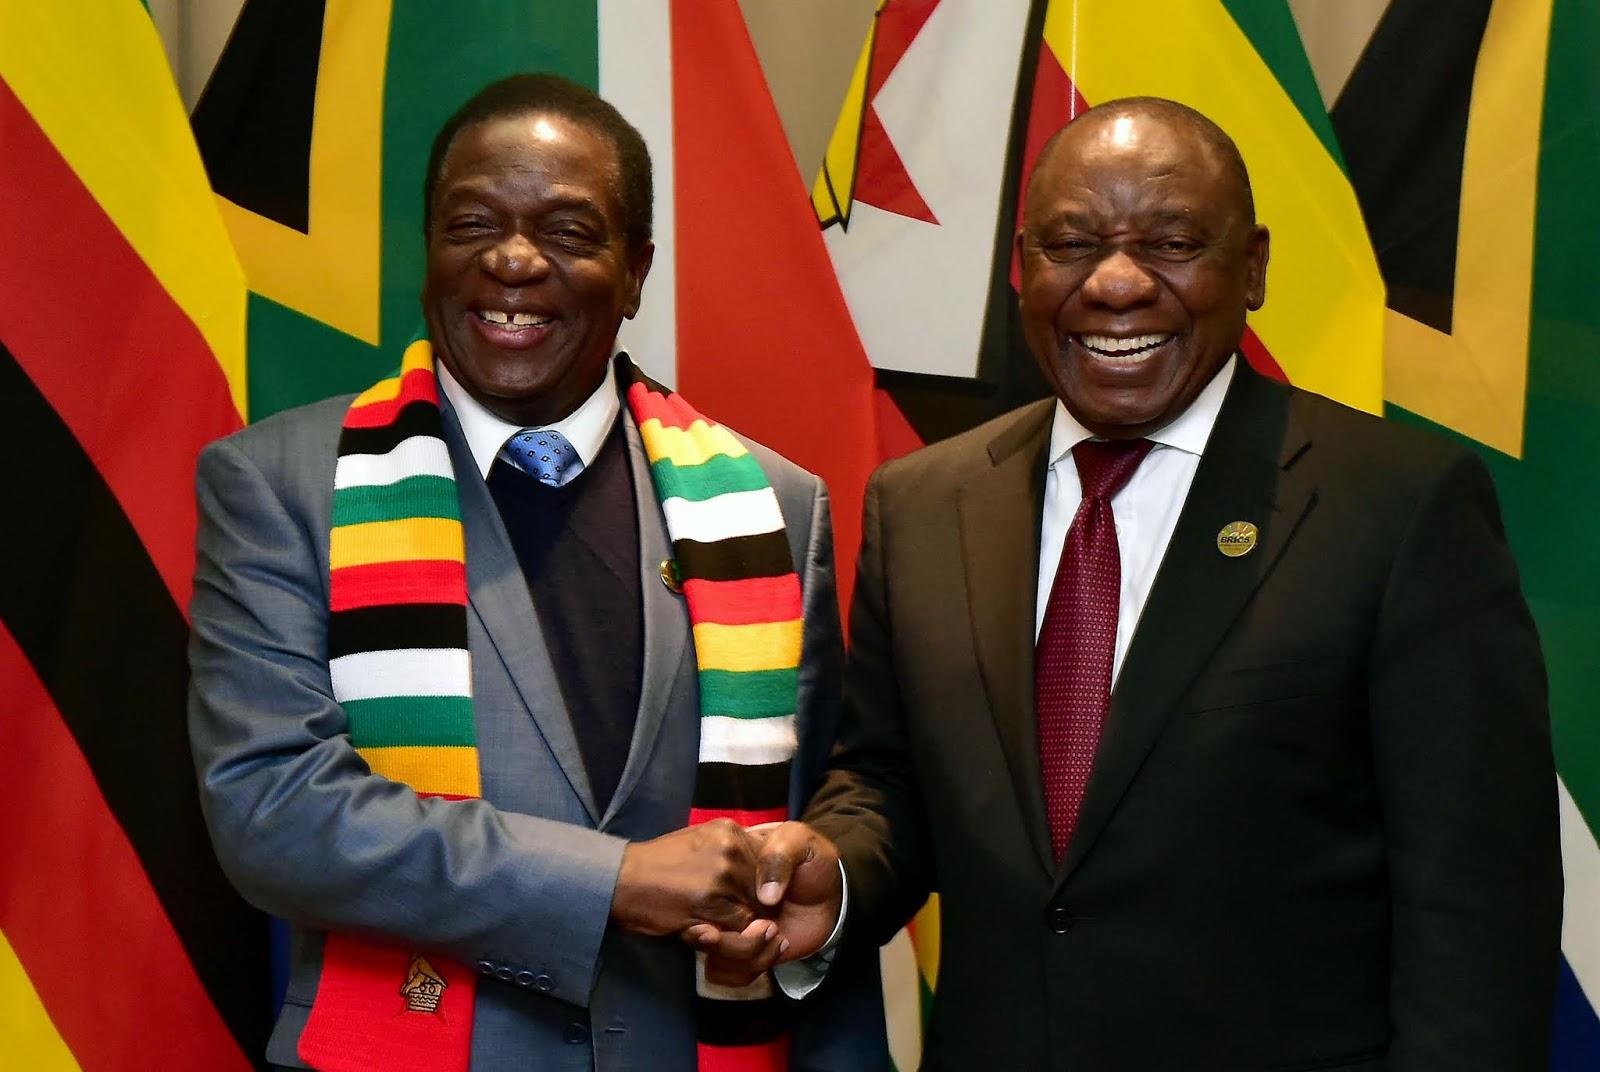 SA 21- Day Lockdown: Zimbabwe To Feel The Pinch!